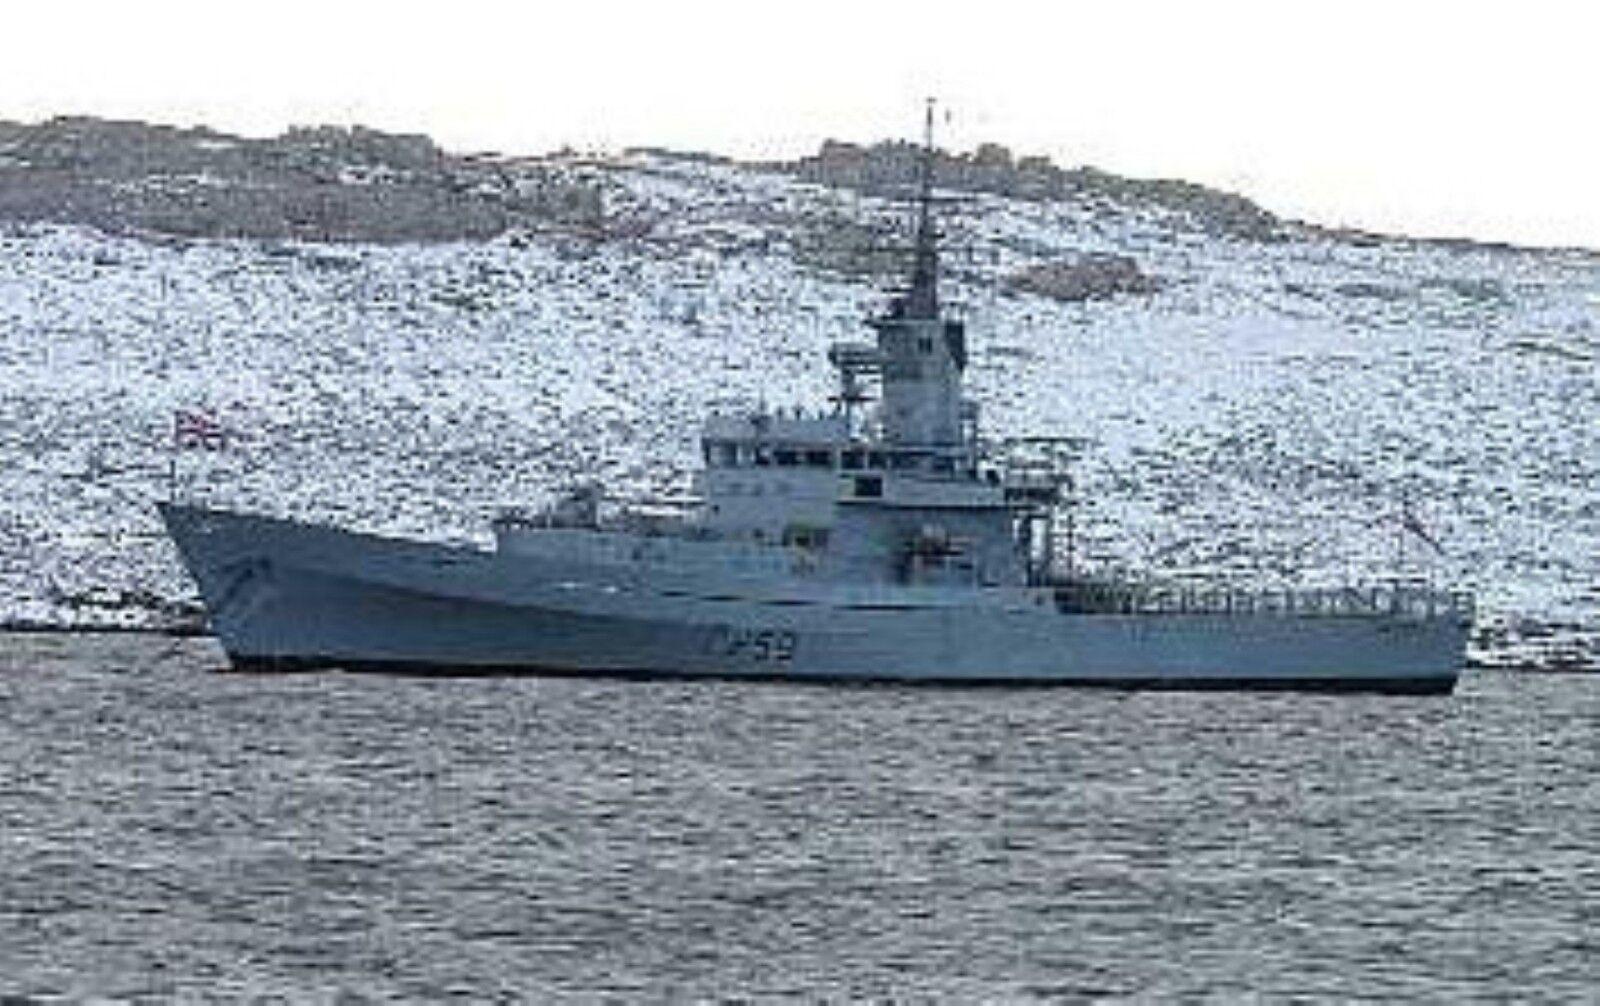 HMS Leeds Castle P 258 M 1:96. modello edifici